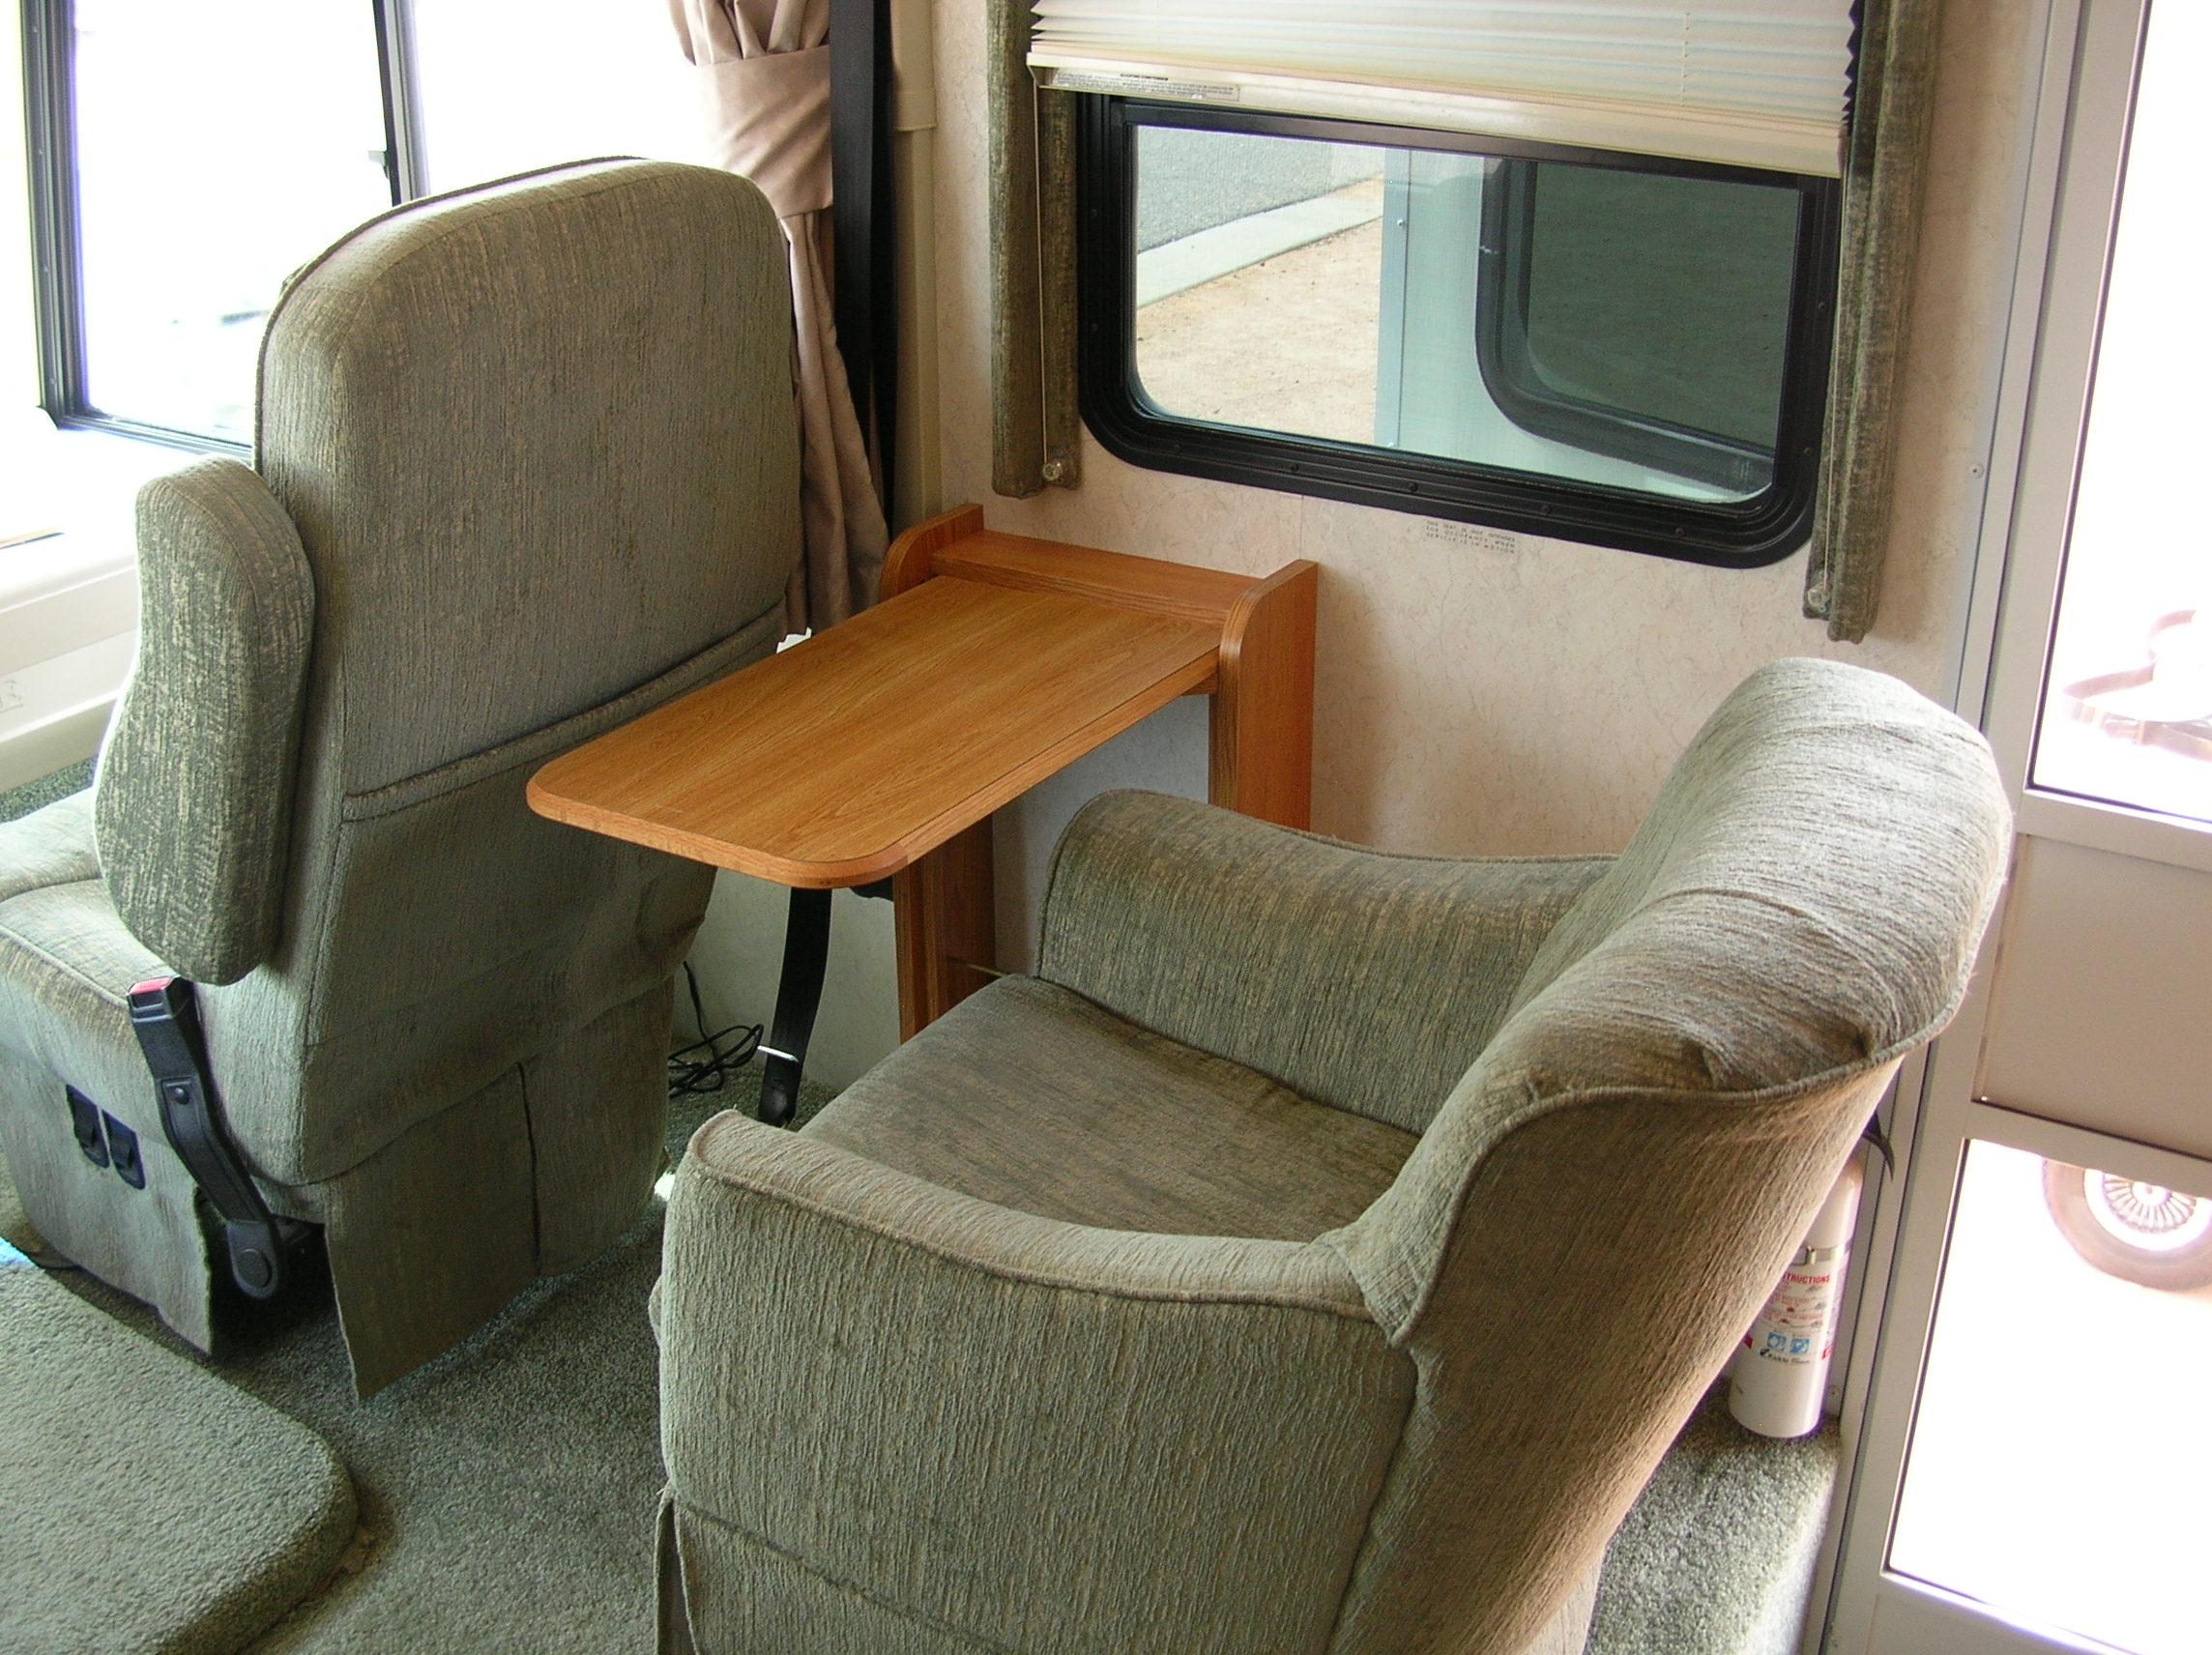 motorhome captain chair seat covers skovby rosewood dining chairs dscn2460 4 jpg